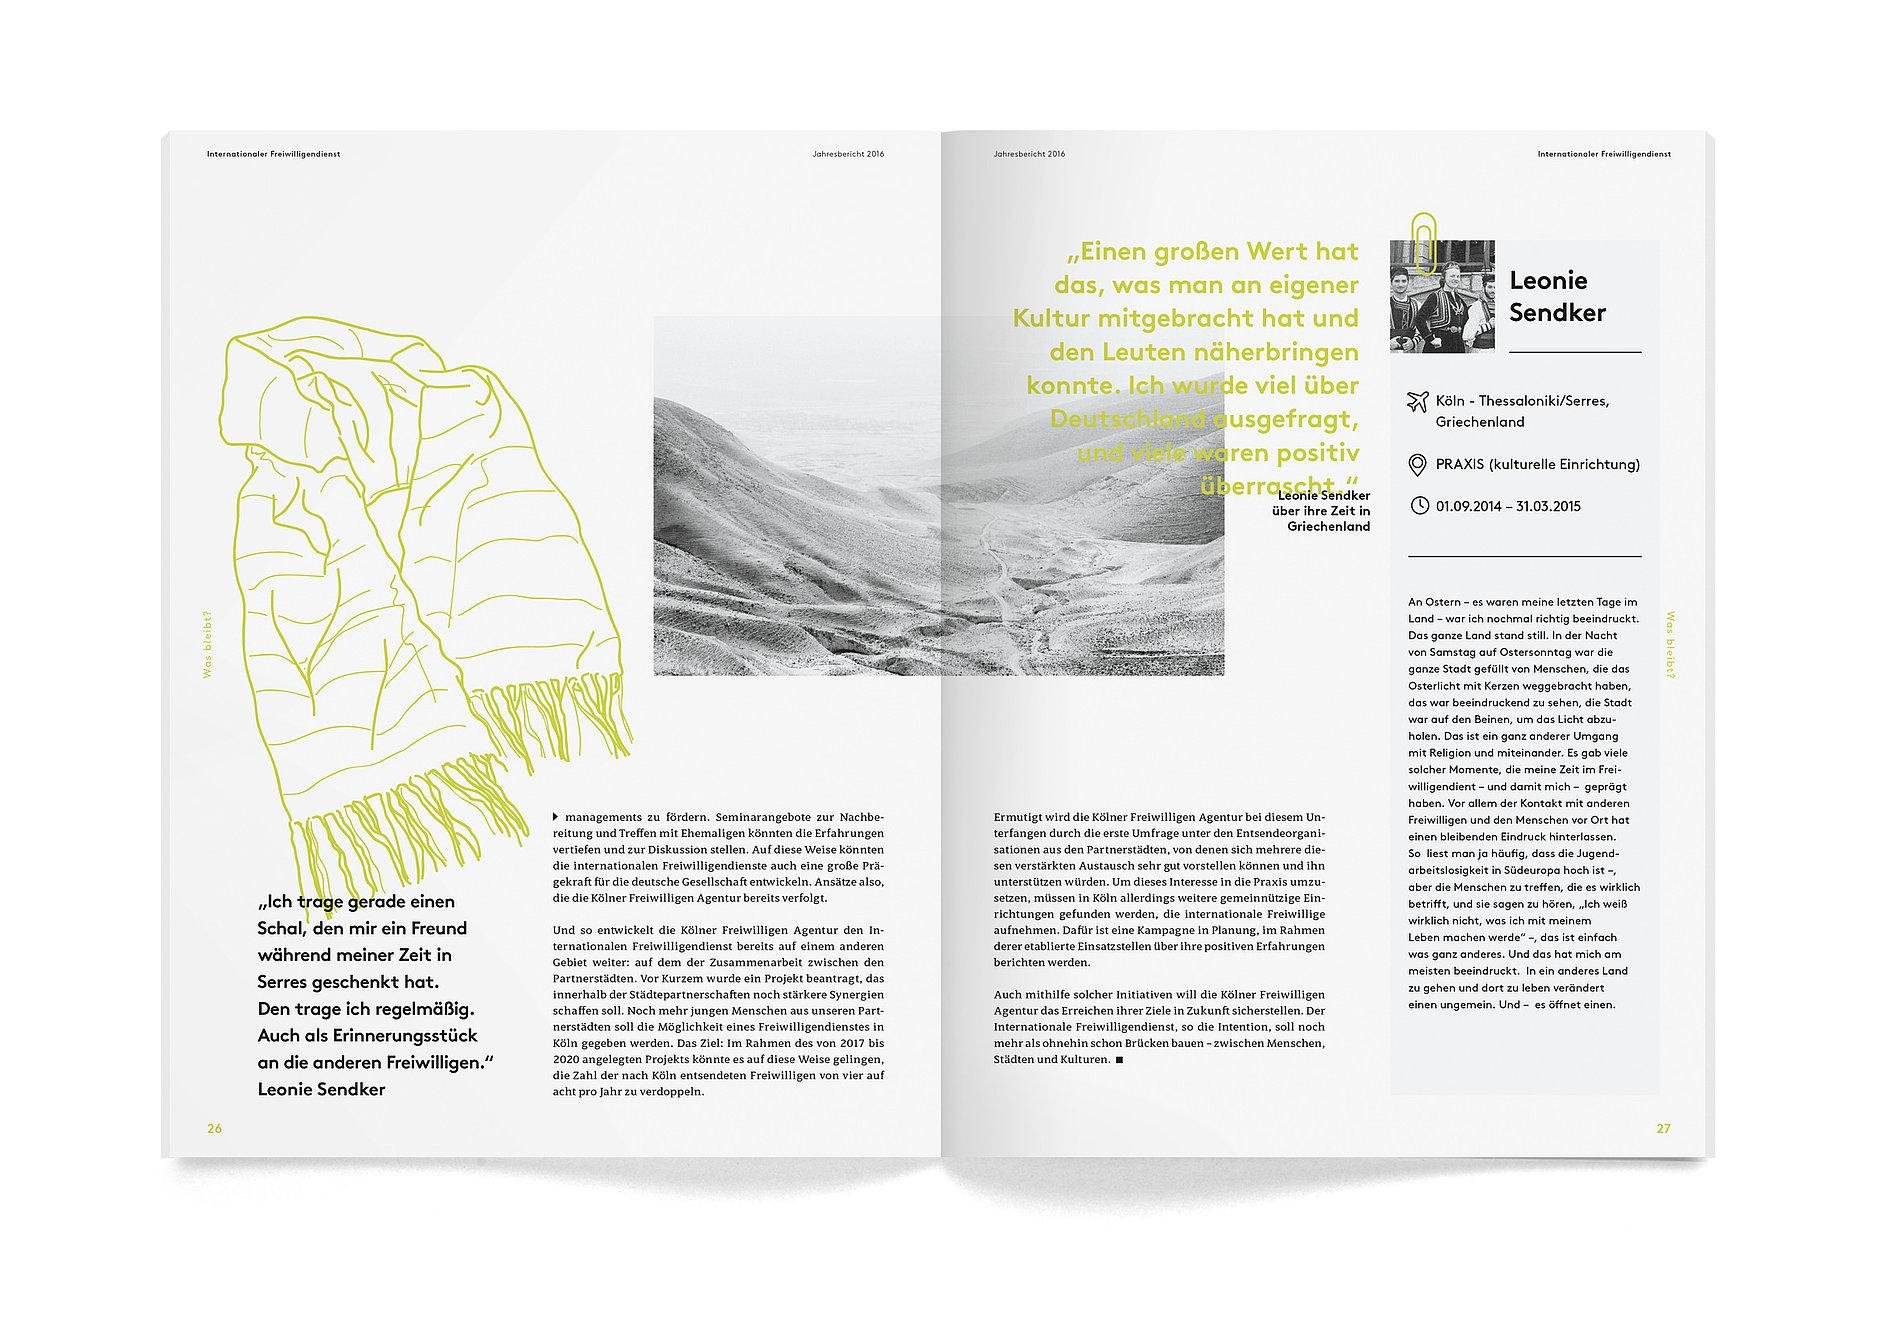 KFA Annual Report 2016 | Red Dot Design Award